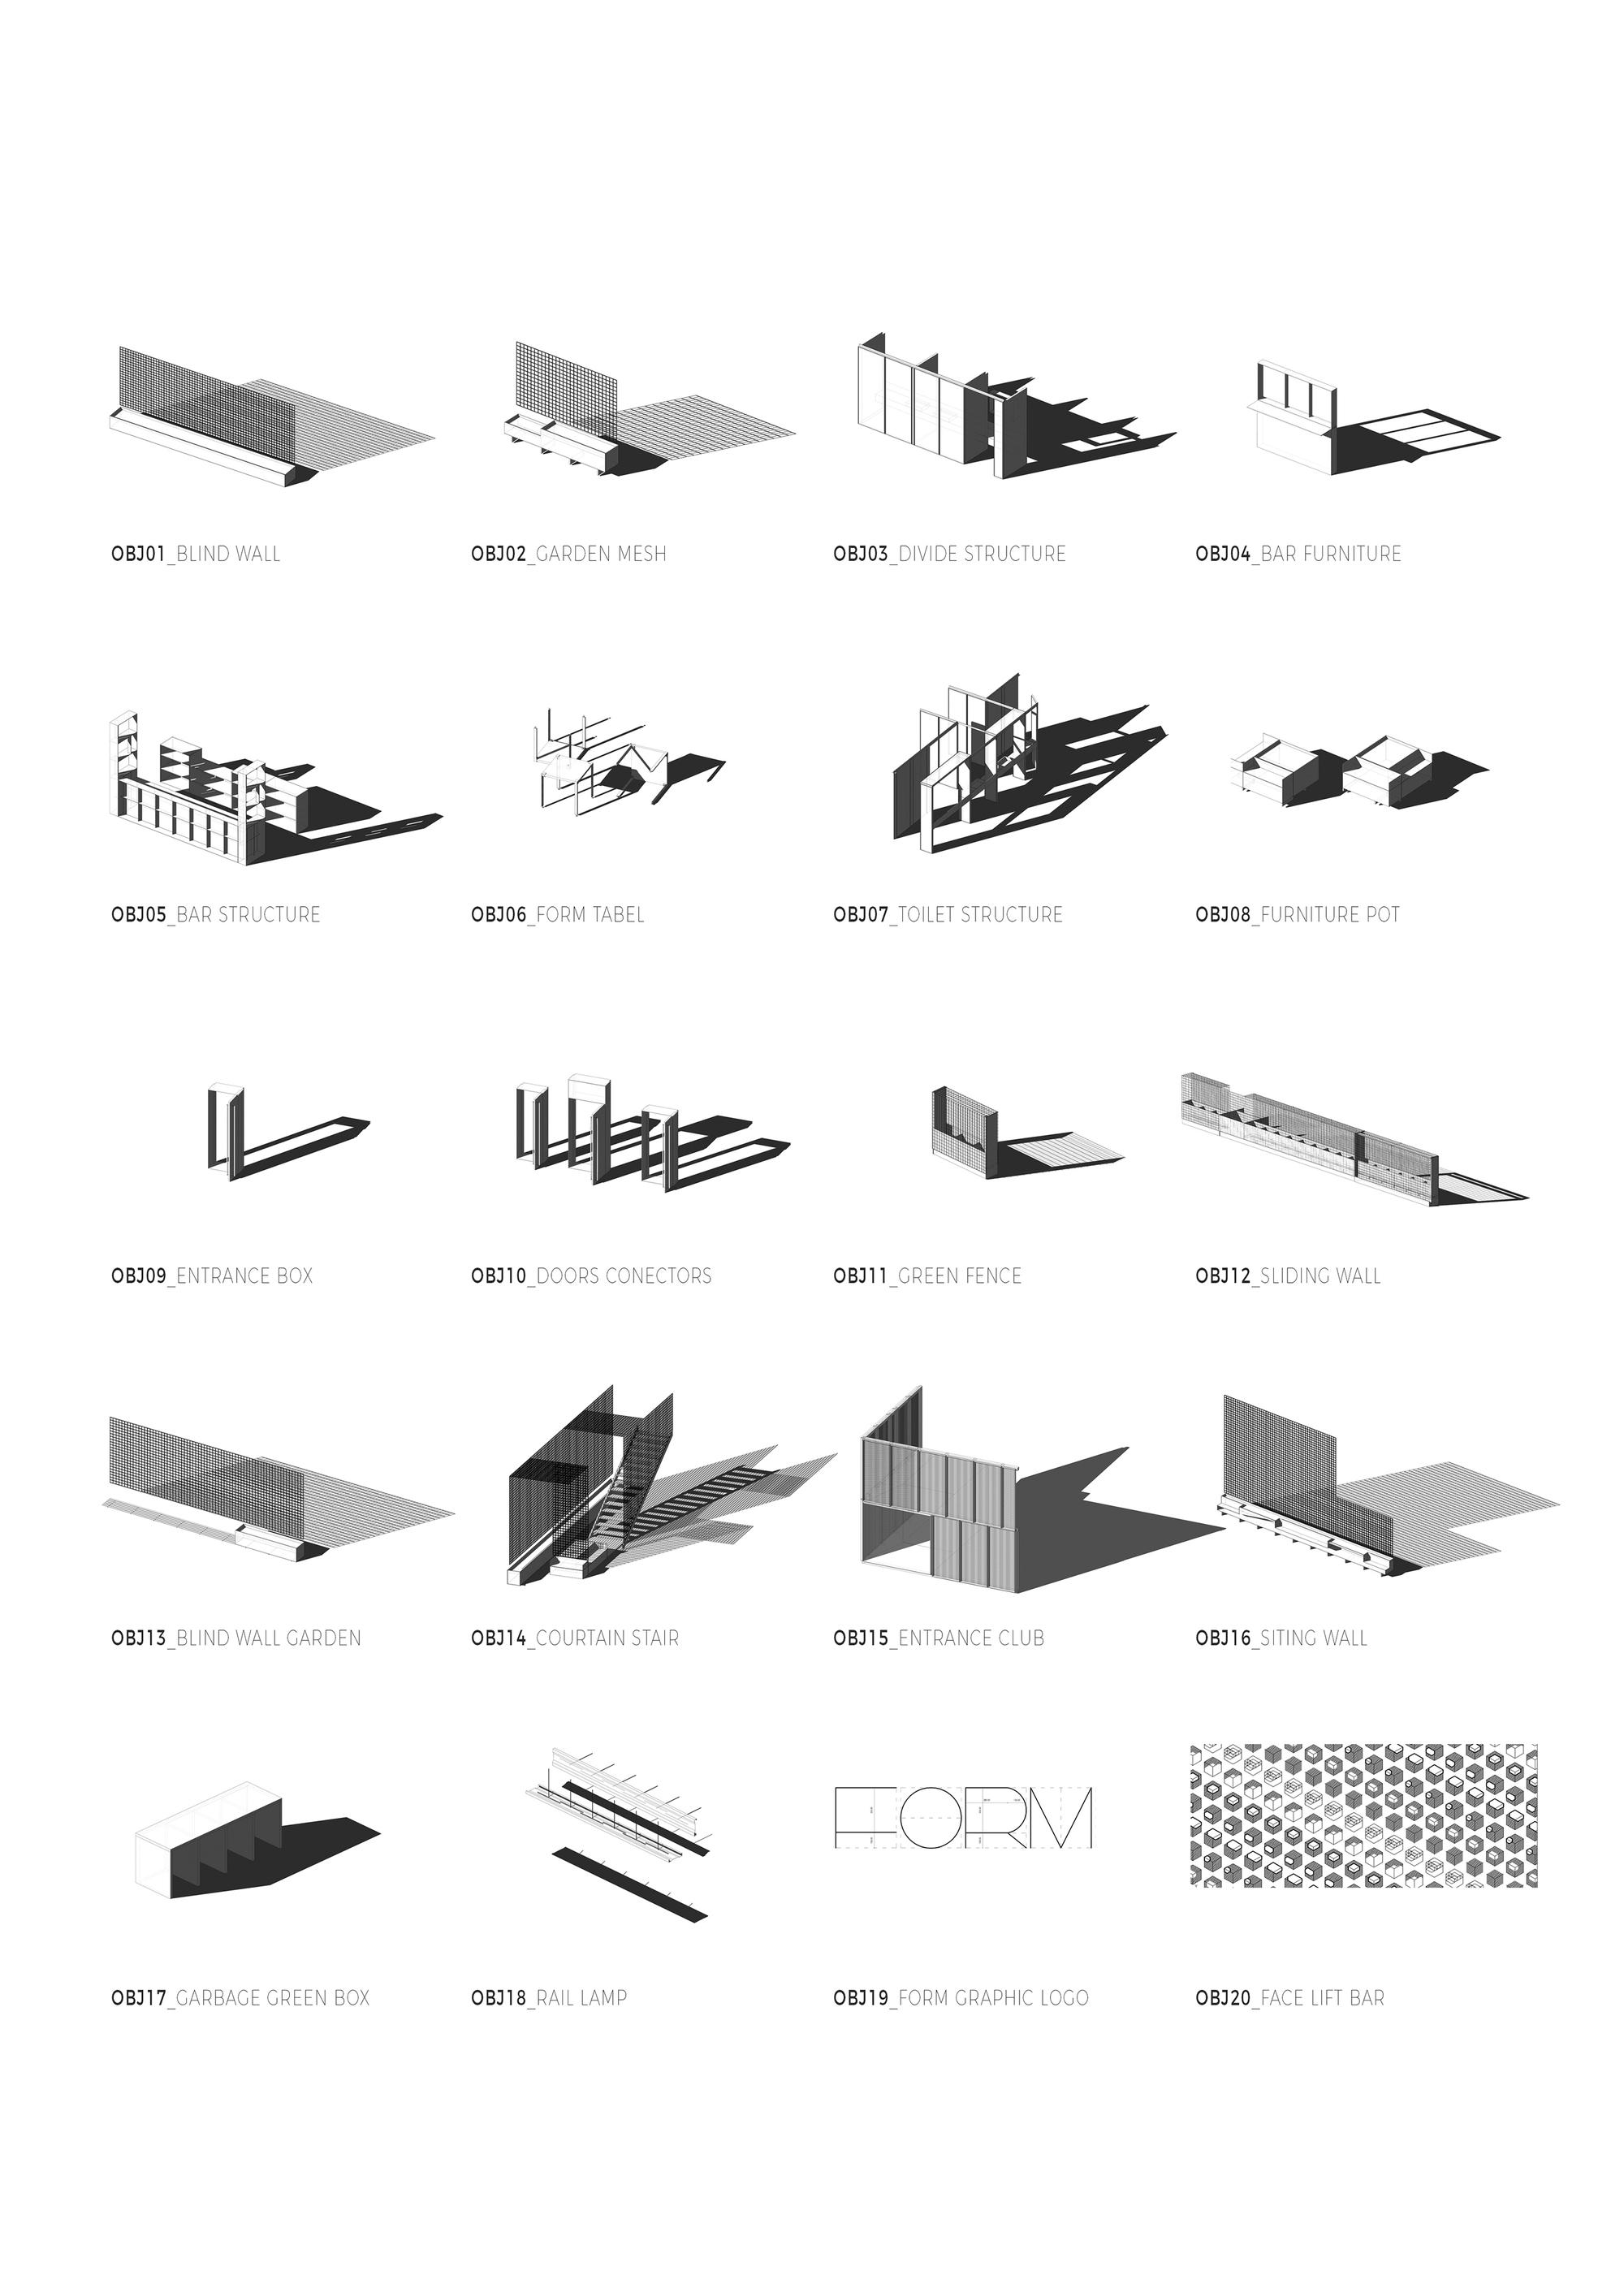 Gallery Of Rehabilitation_vl173 Cra De 30 # Schema De Meuble Dimension